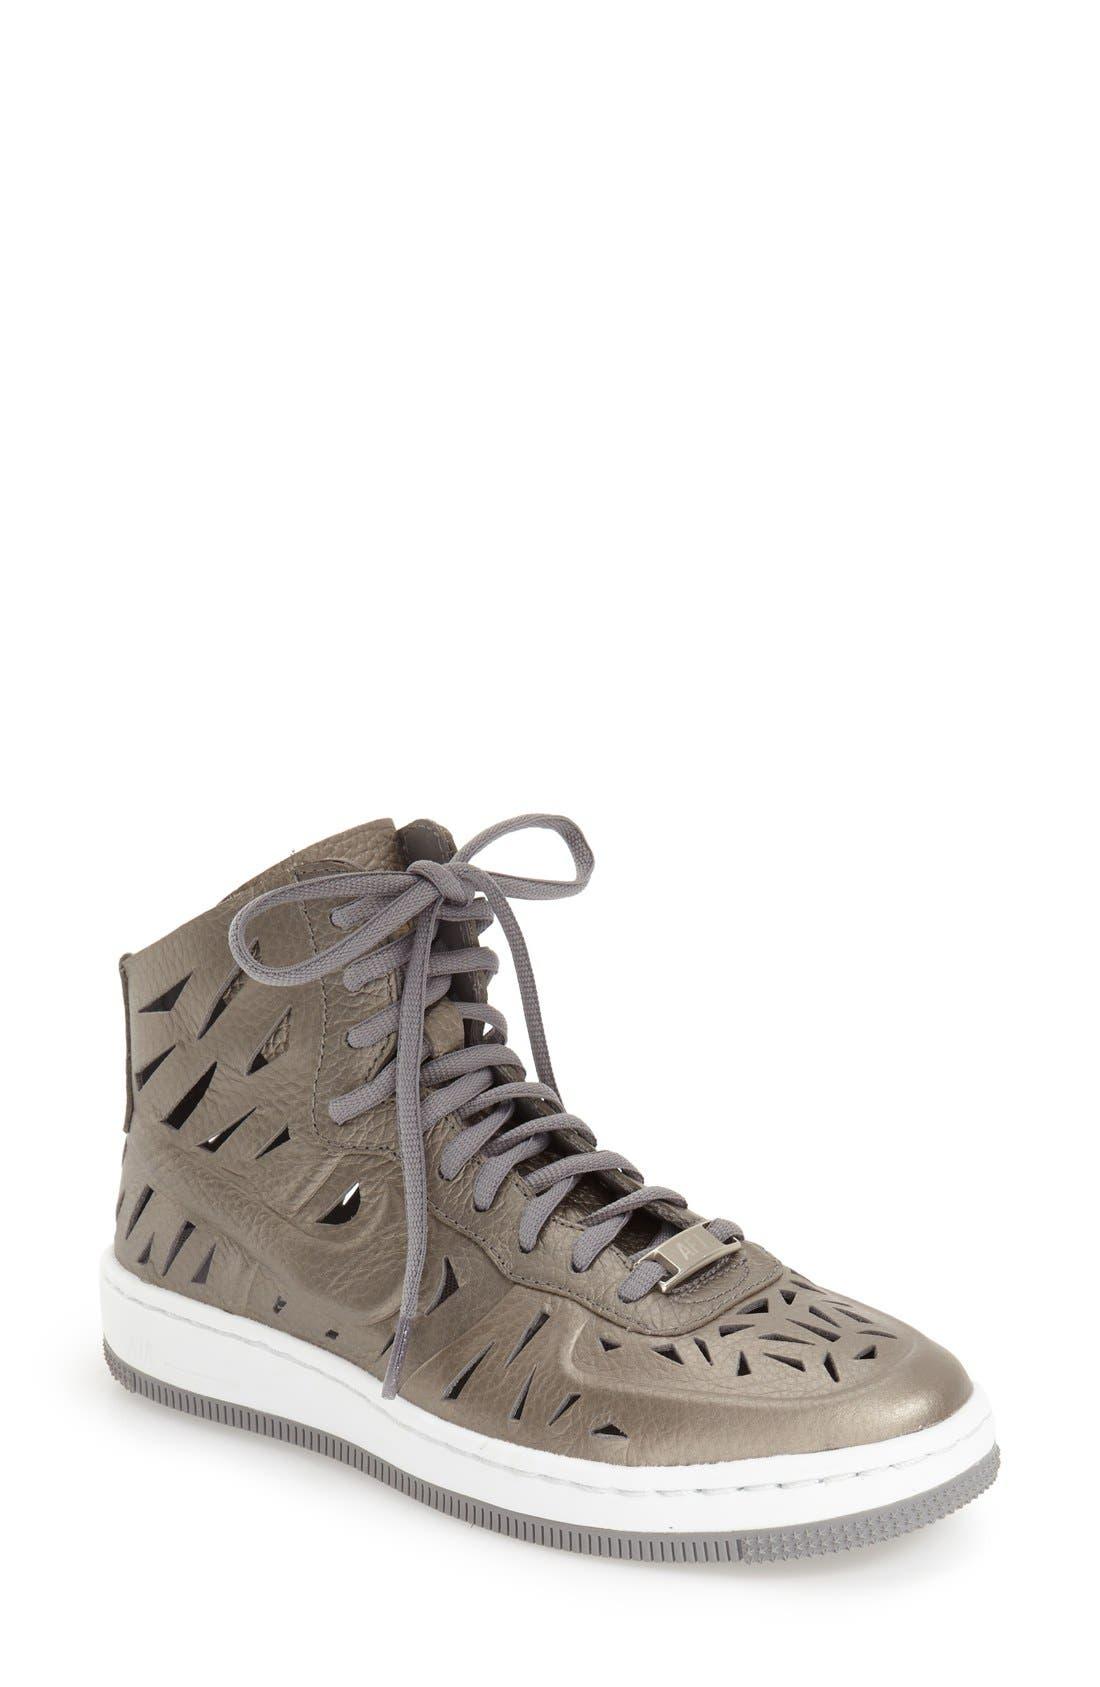 Alternate Image 1 Selected - Nike 'Air Force 1 - Ultra Force Joli' High Top Sneaker (Women)